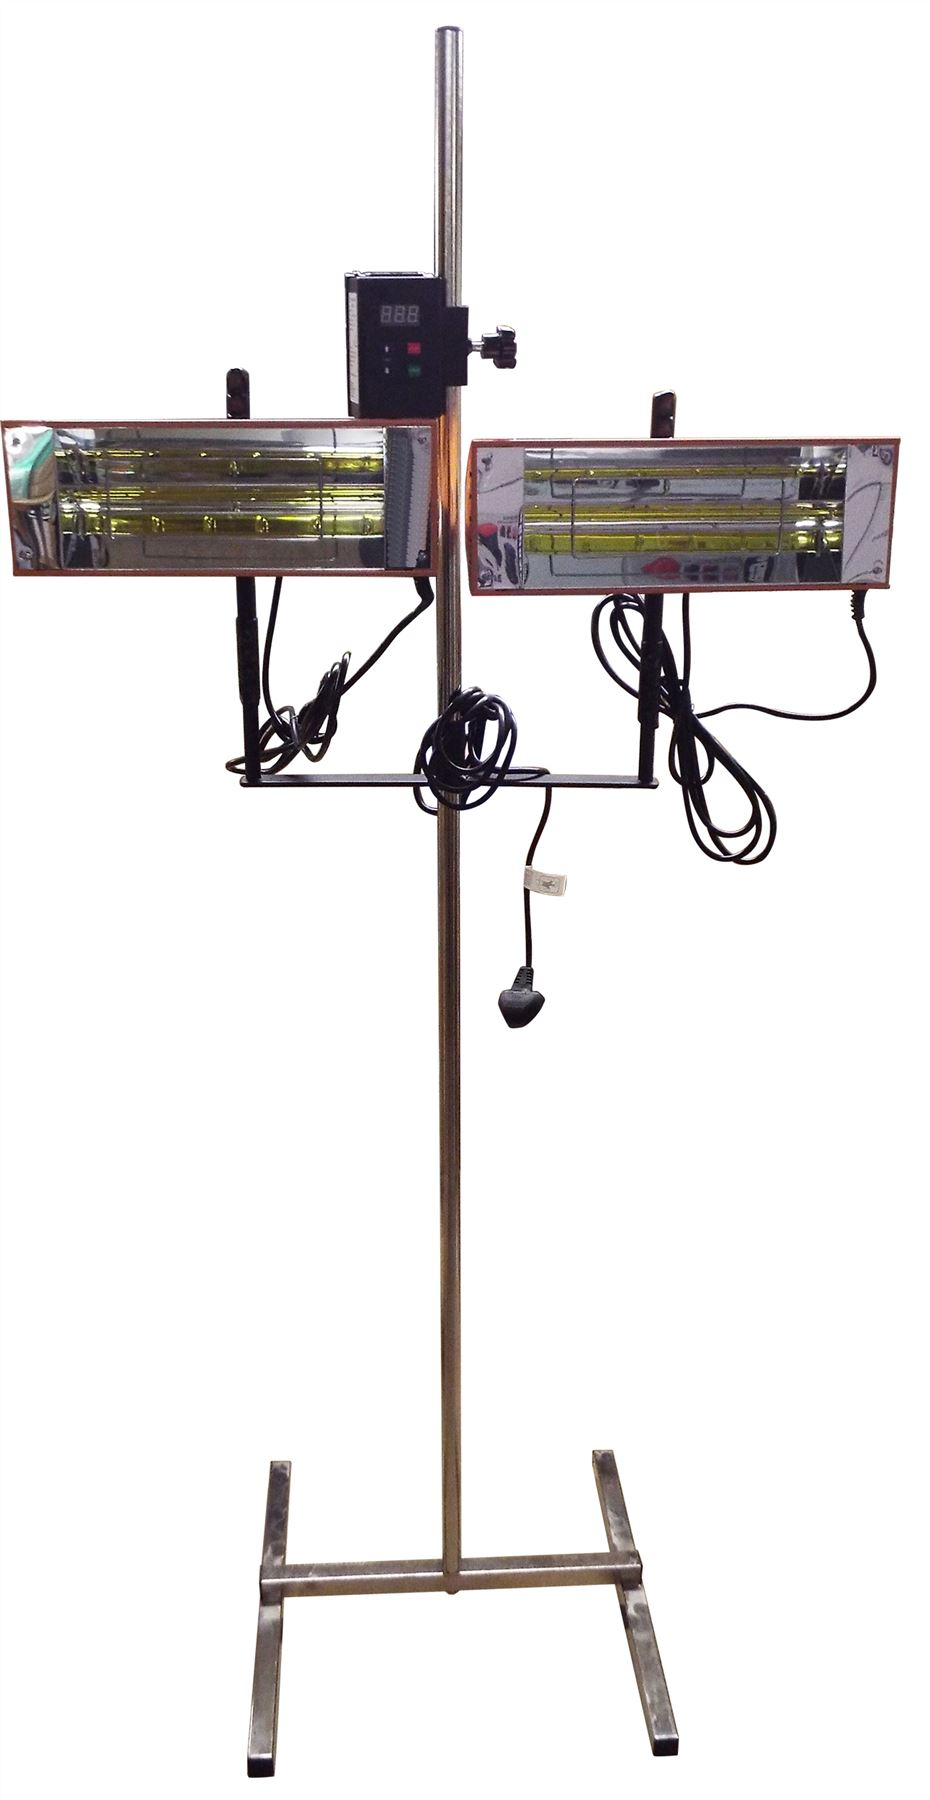 Twin 1 0kw Infrared Heater Car Bodywork Repair Paint Dryer Stand Digital Timer Ebay